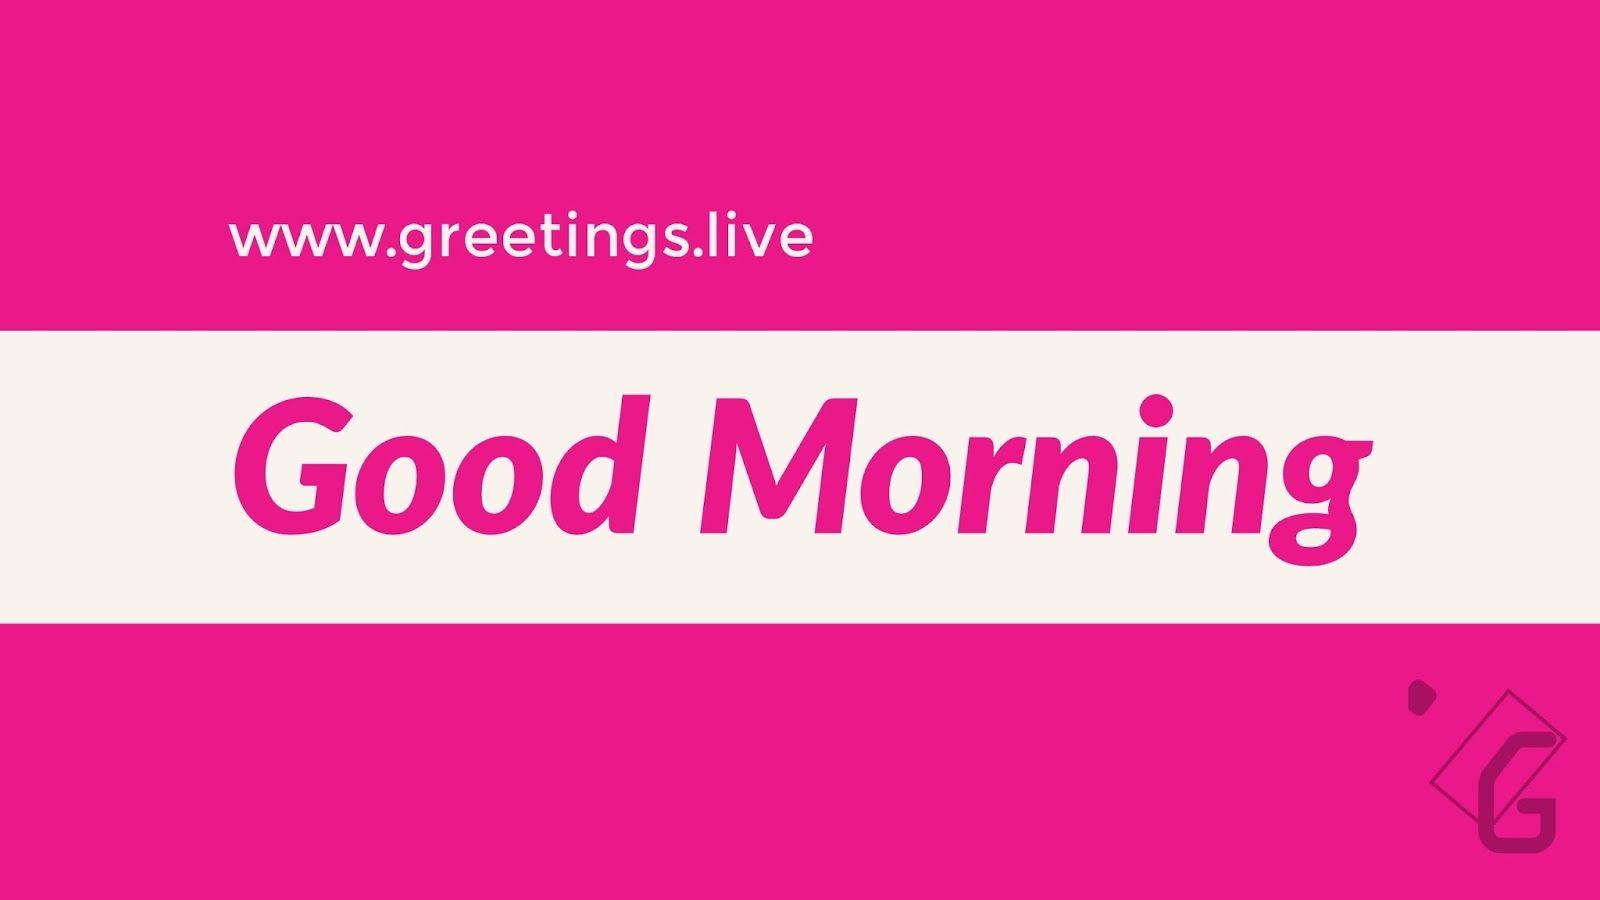 Good Morning Greetings On Magneta Colour Background Good Morning